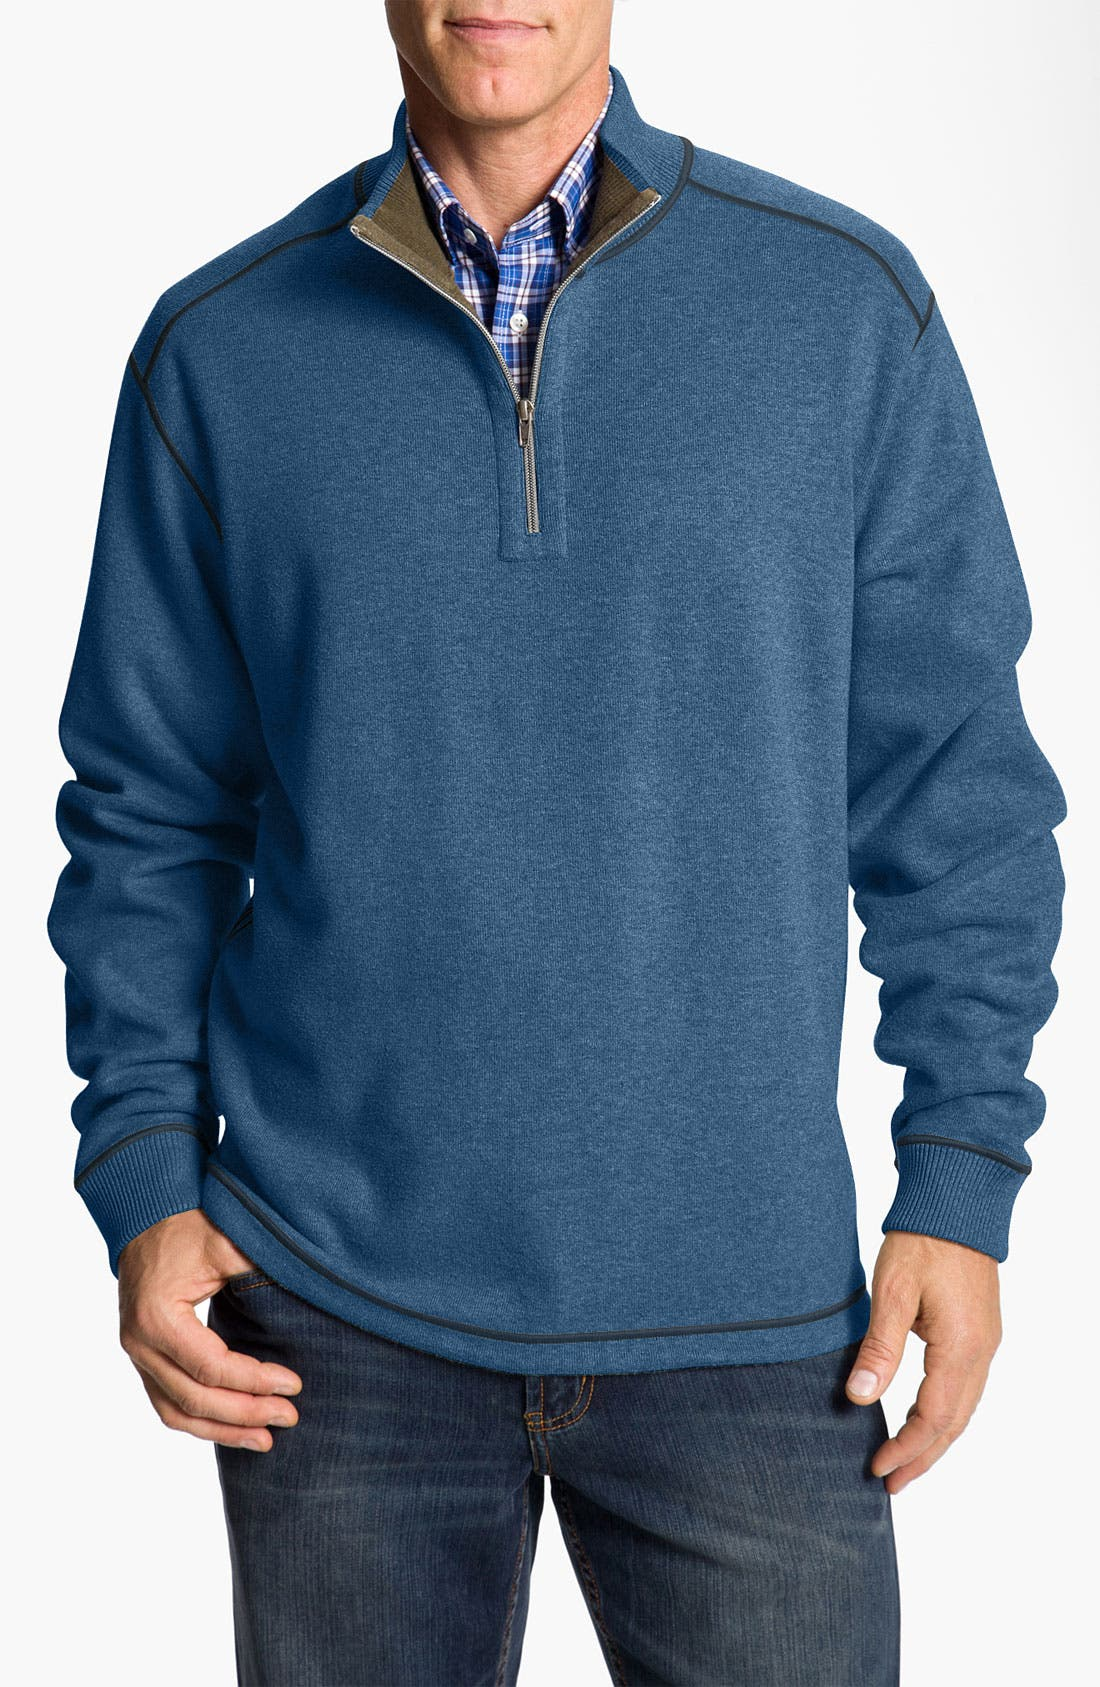 Alternate Image 1 Selected - Cutter & Buck 'Essex' Reversible Half Zip Sweatshirt (Big & Tall)